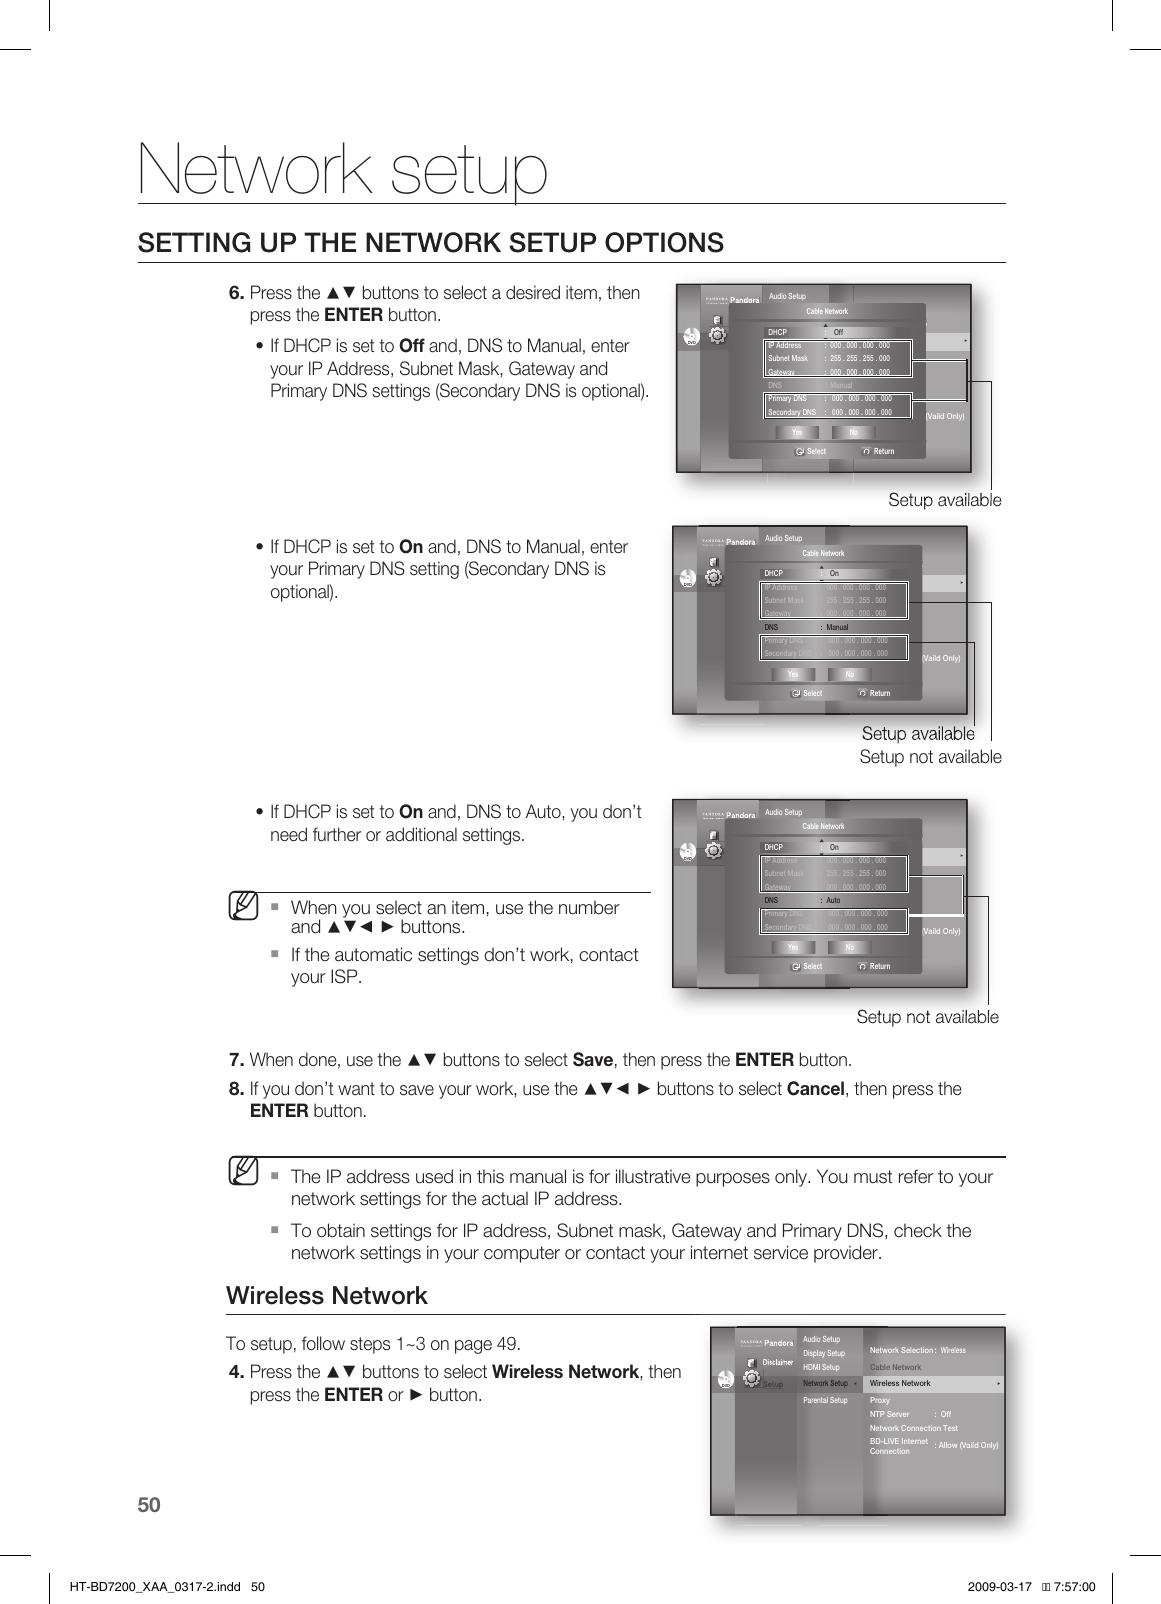 Samsung Ht Bd7200 Users Manual BD7200_XAA_0317 1